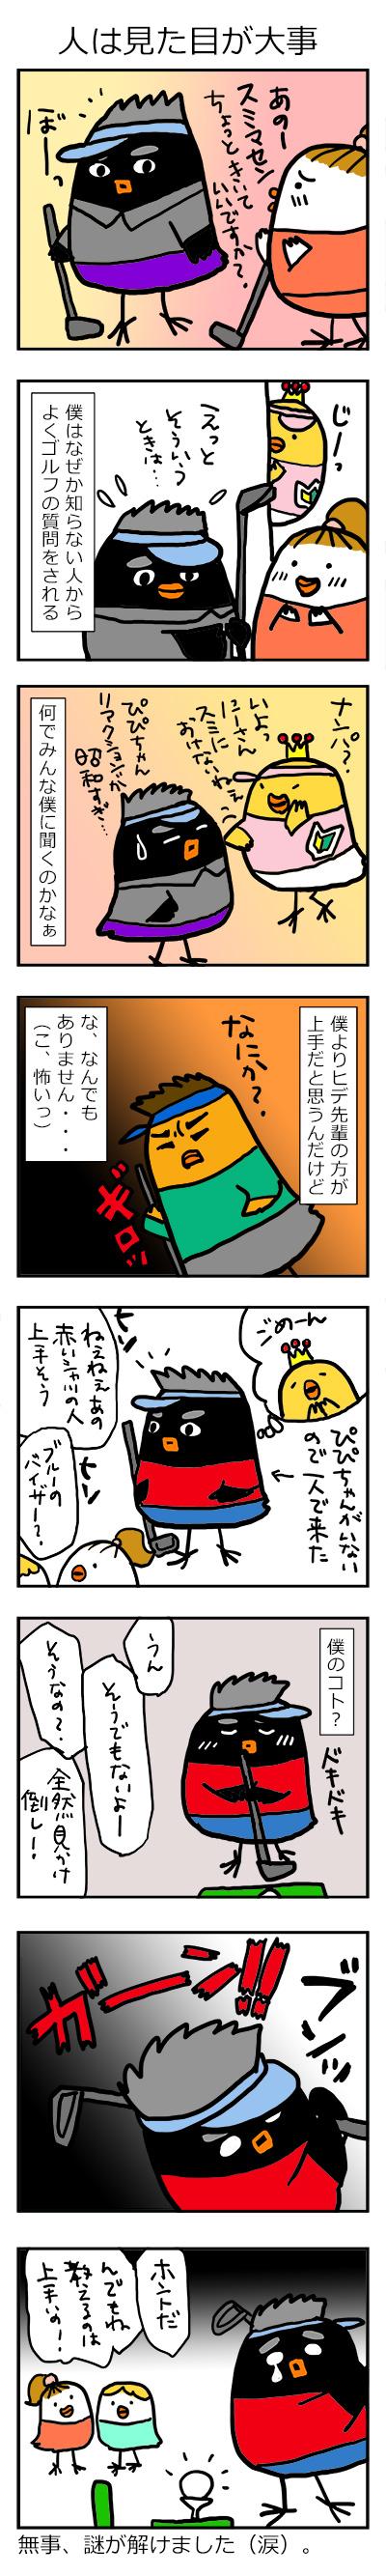 13_hina1